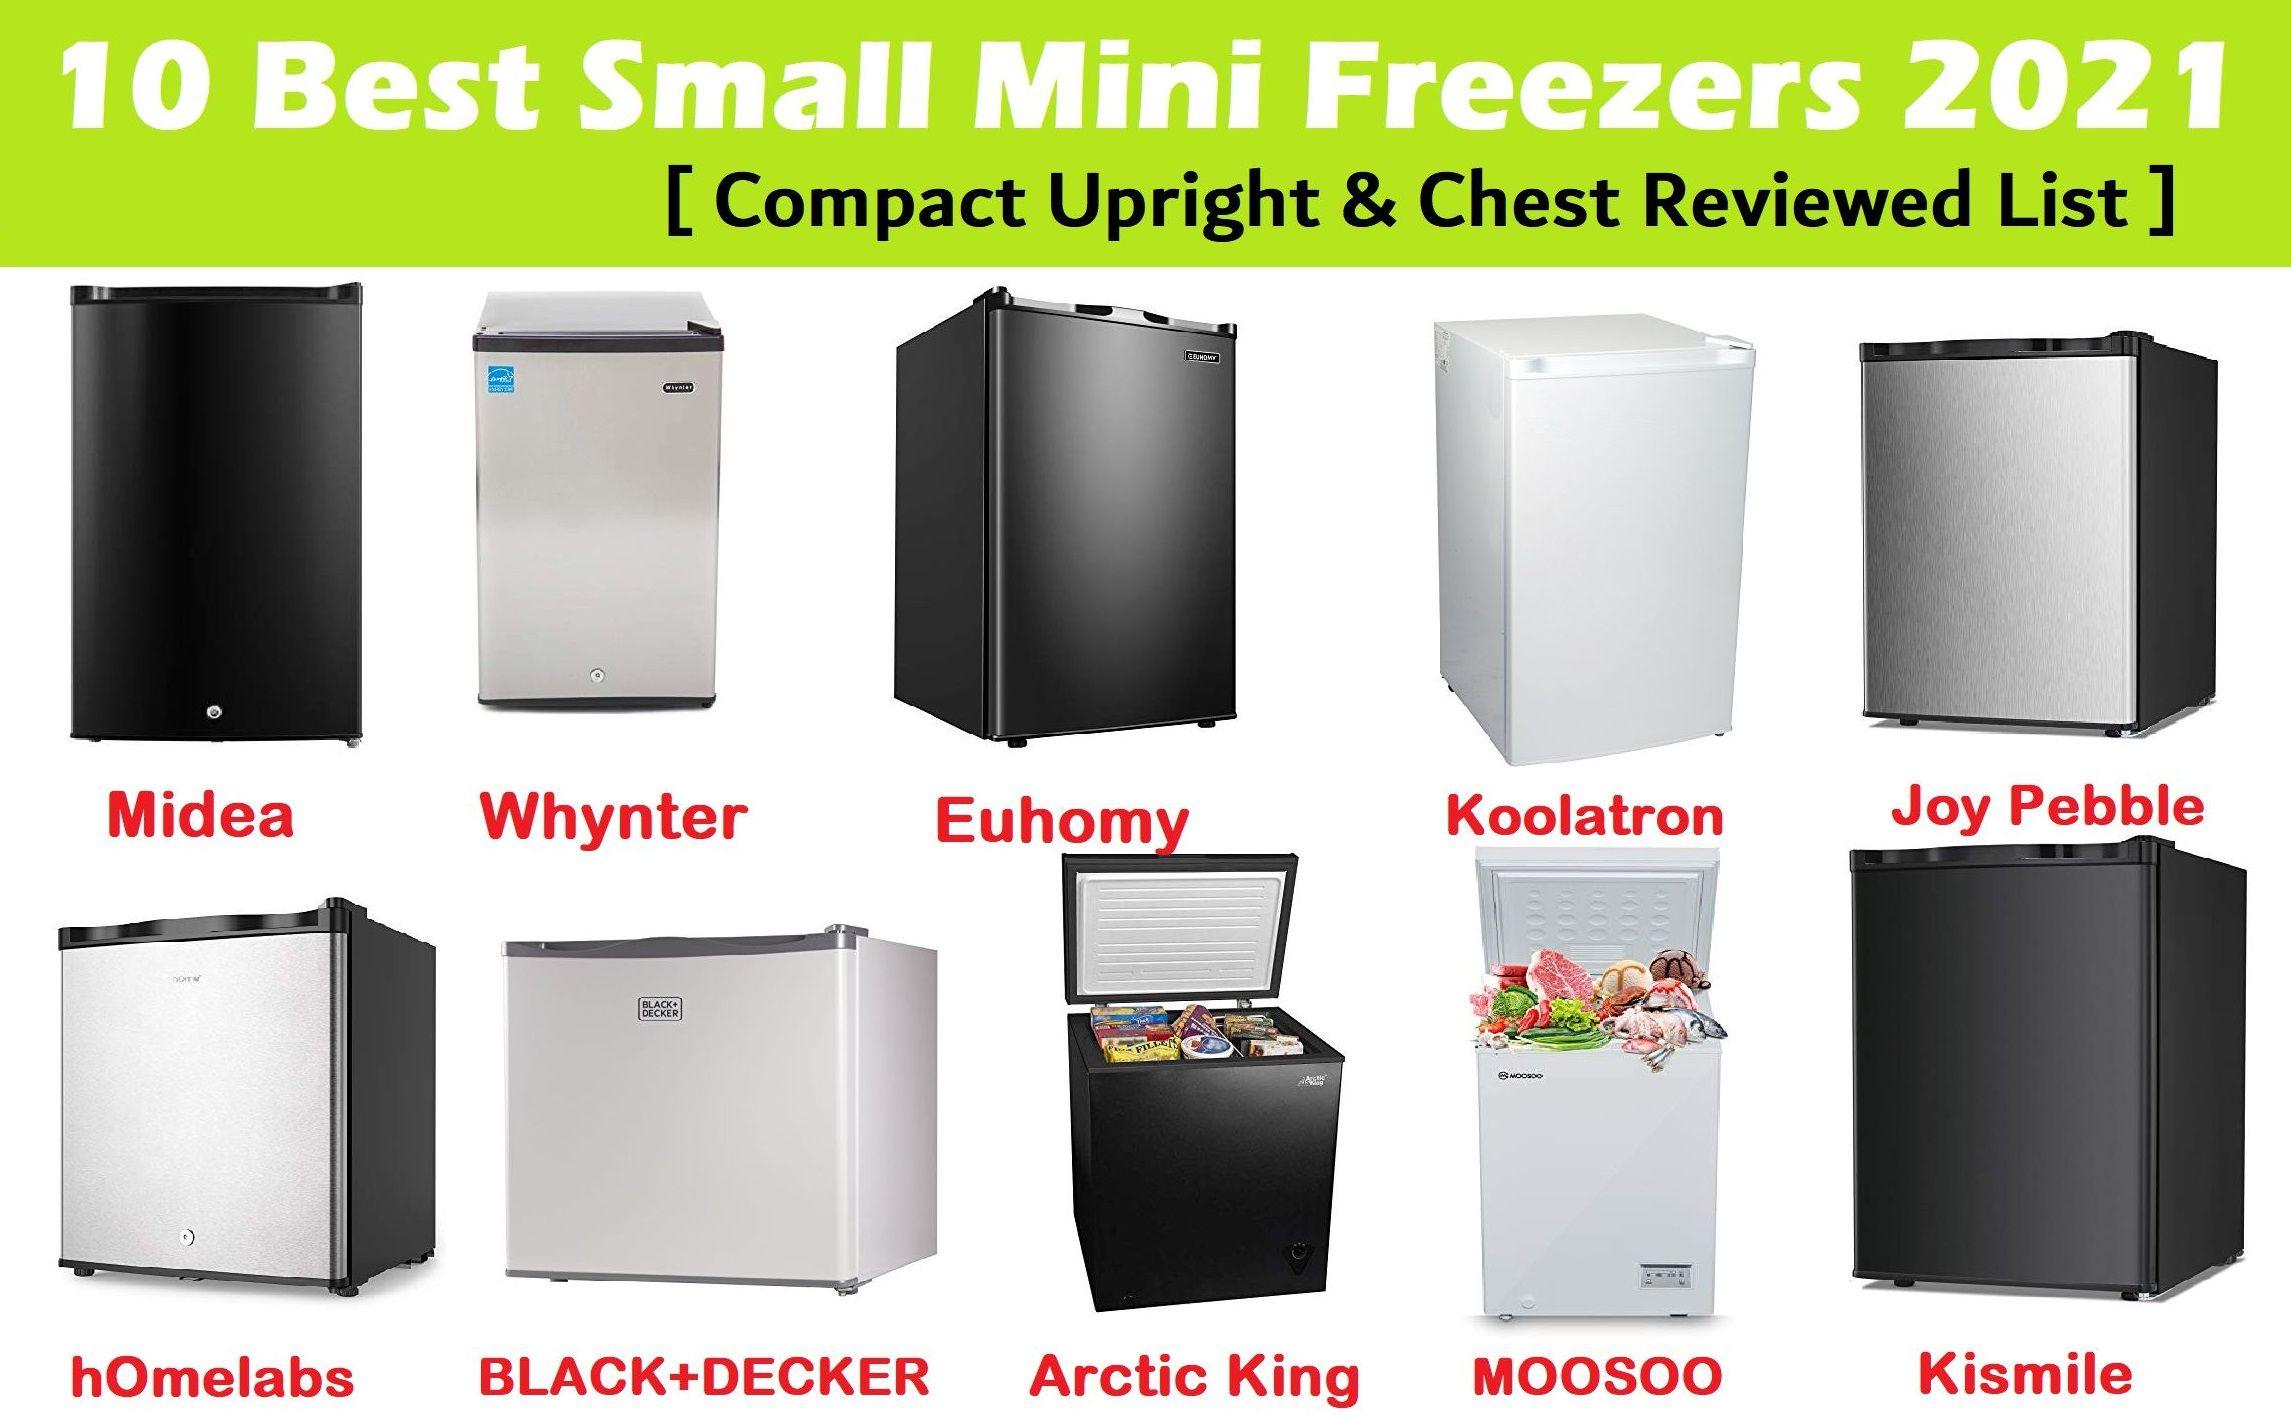 10 Best Small Mini Freezer 2020 Review & Comparison- Compact Chests & Uprights - Midea vs Whynter vs Euhomy vs hOmelabs vs BLACK+DECKER vs Koolatron vs Danby